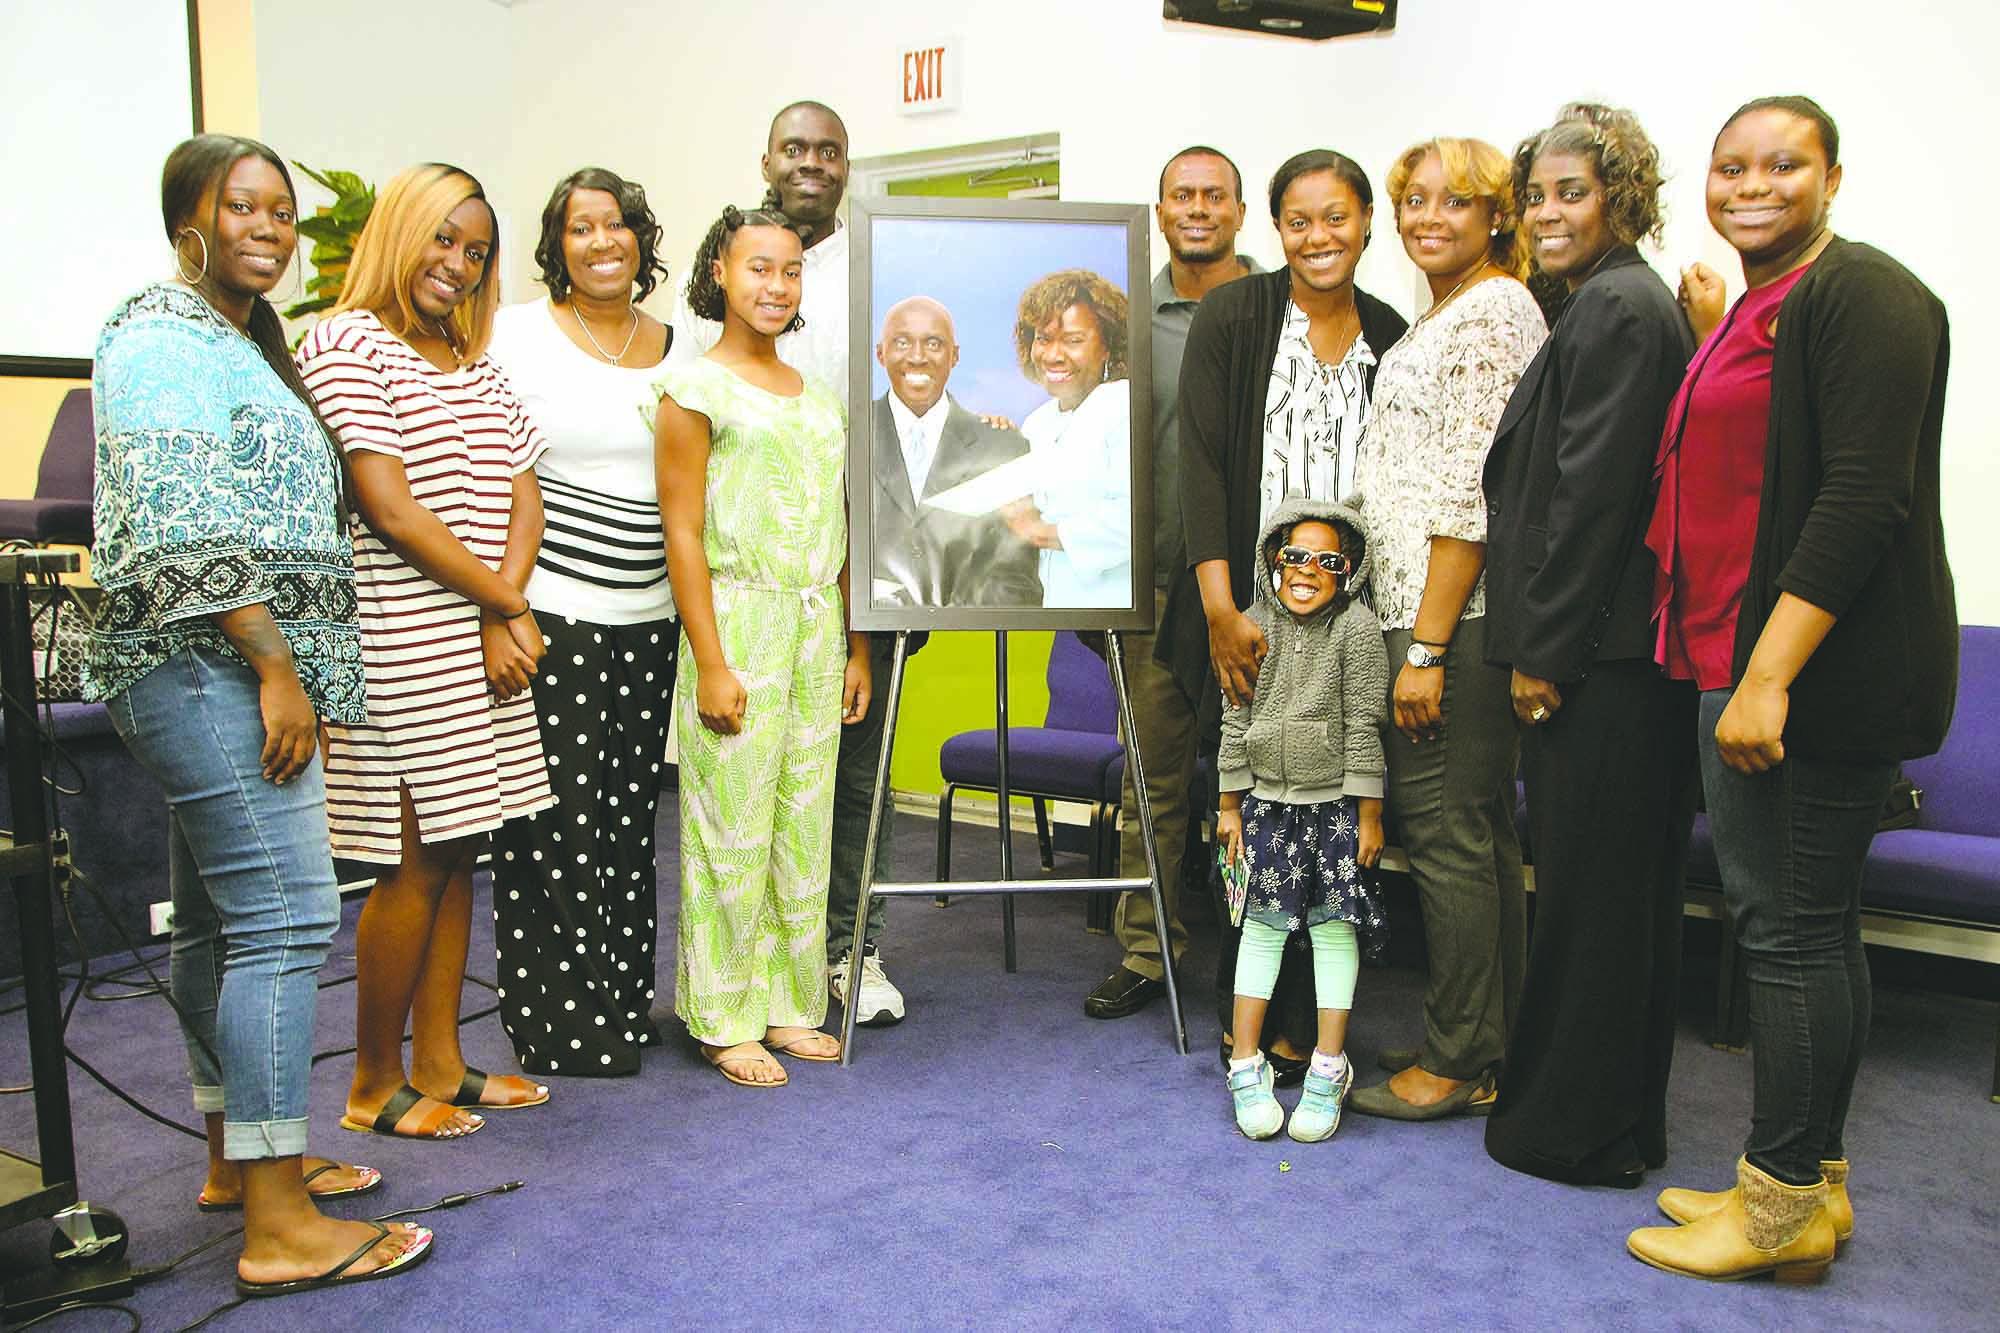 Rev. Claude S. Williams Friends Family, featured